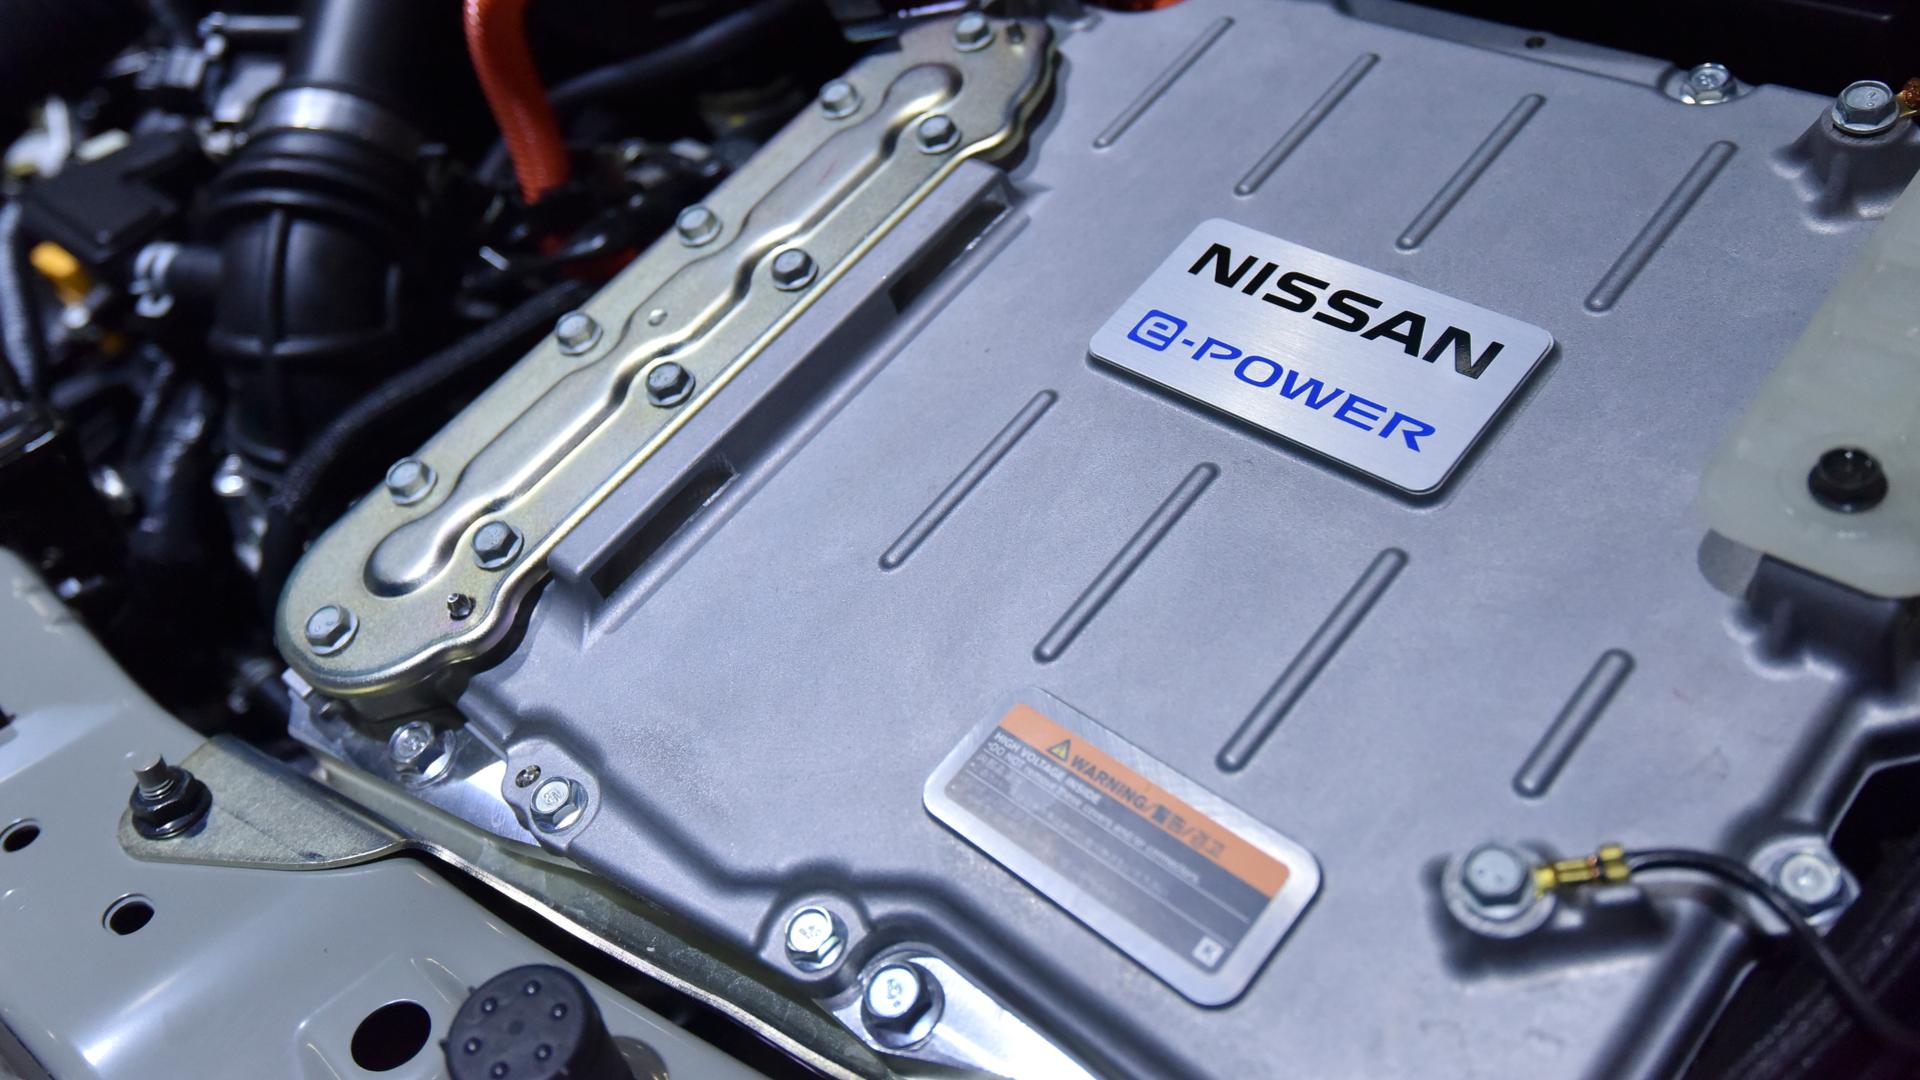 motor nissan e power carro eletrico shutterstock 1244844544